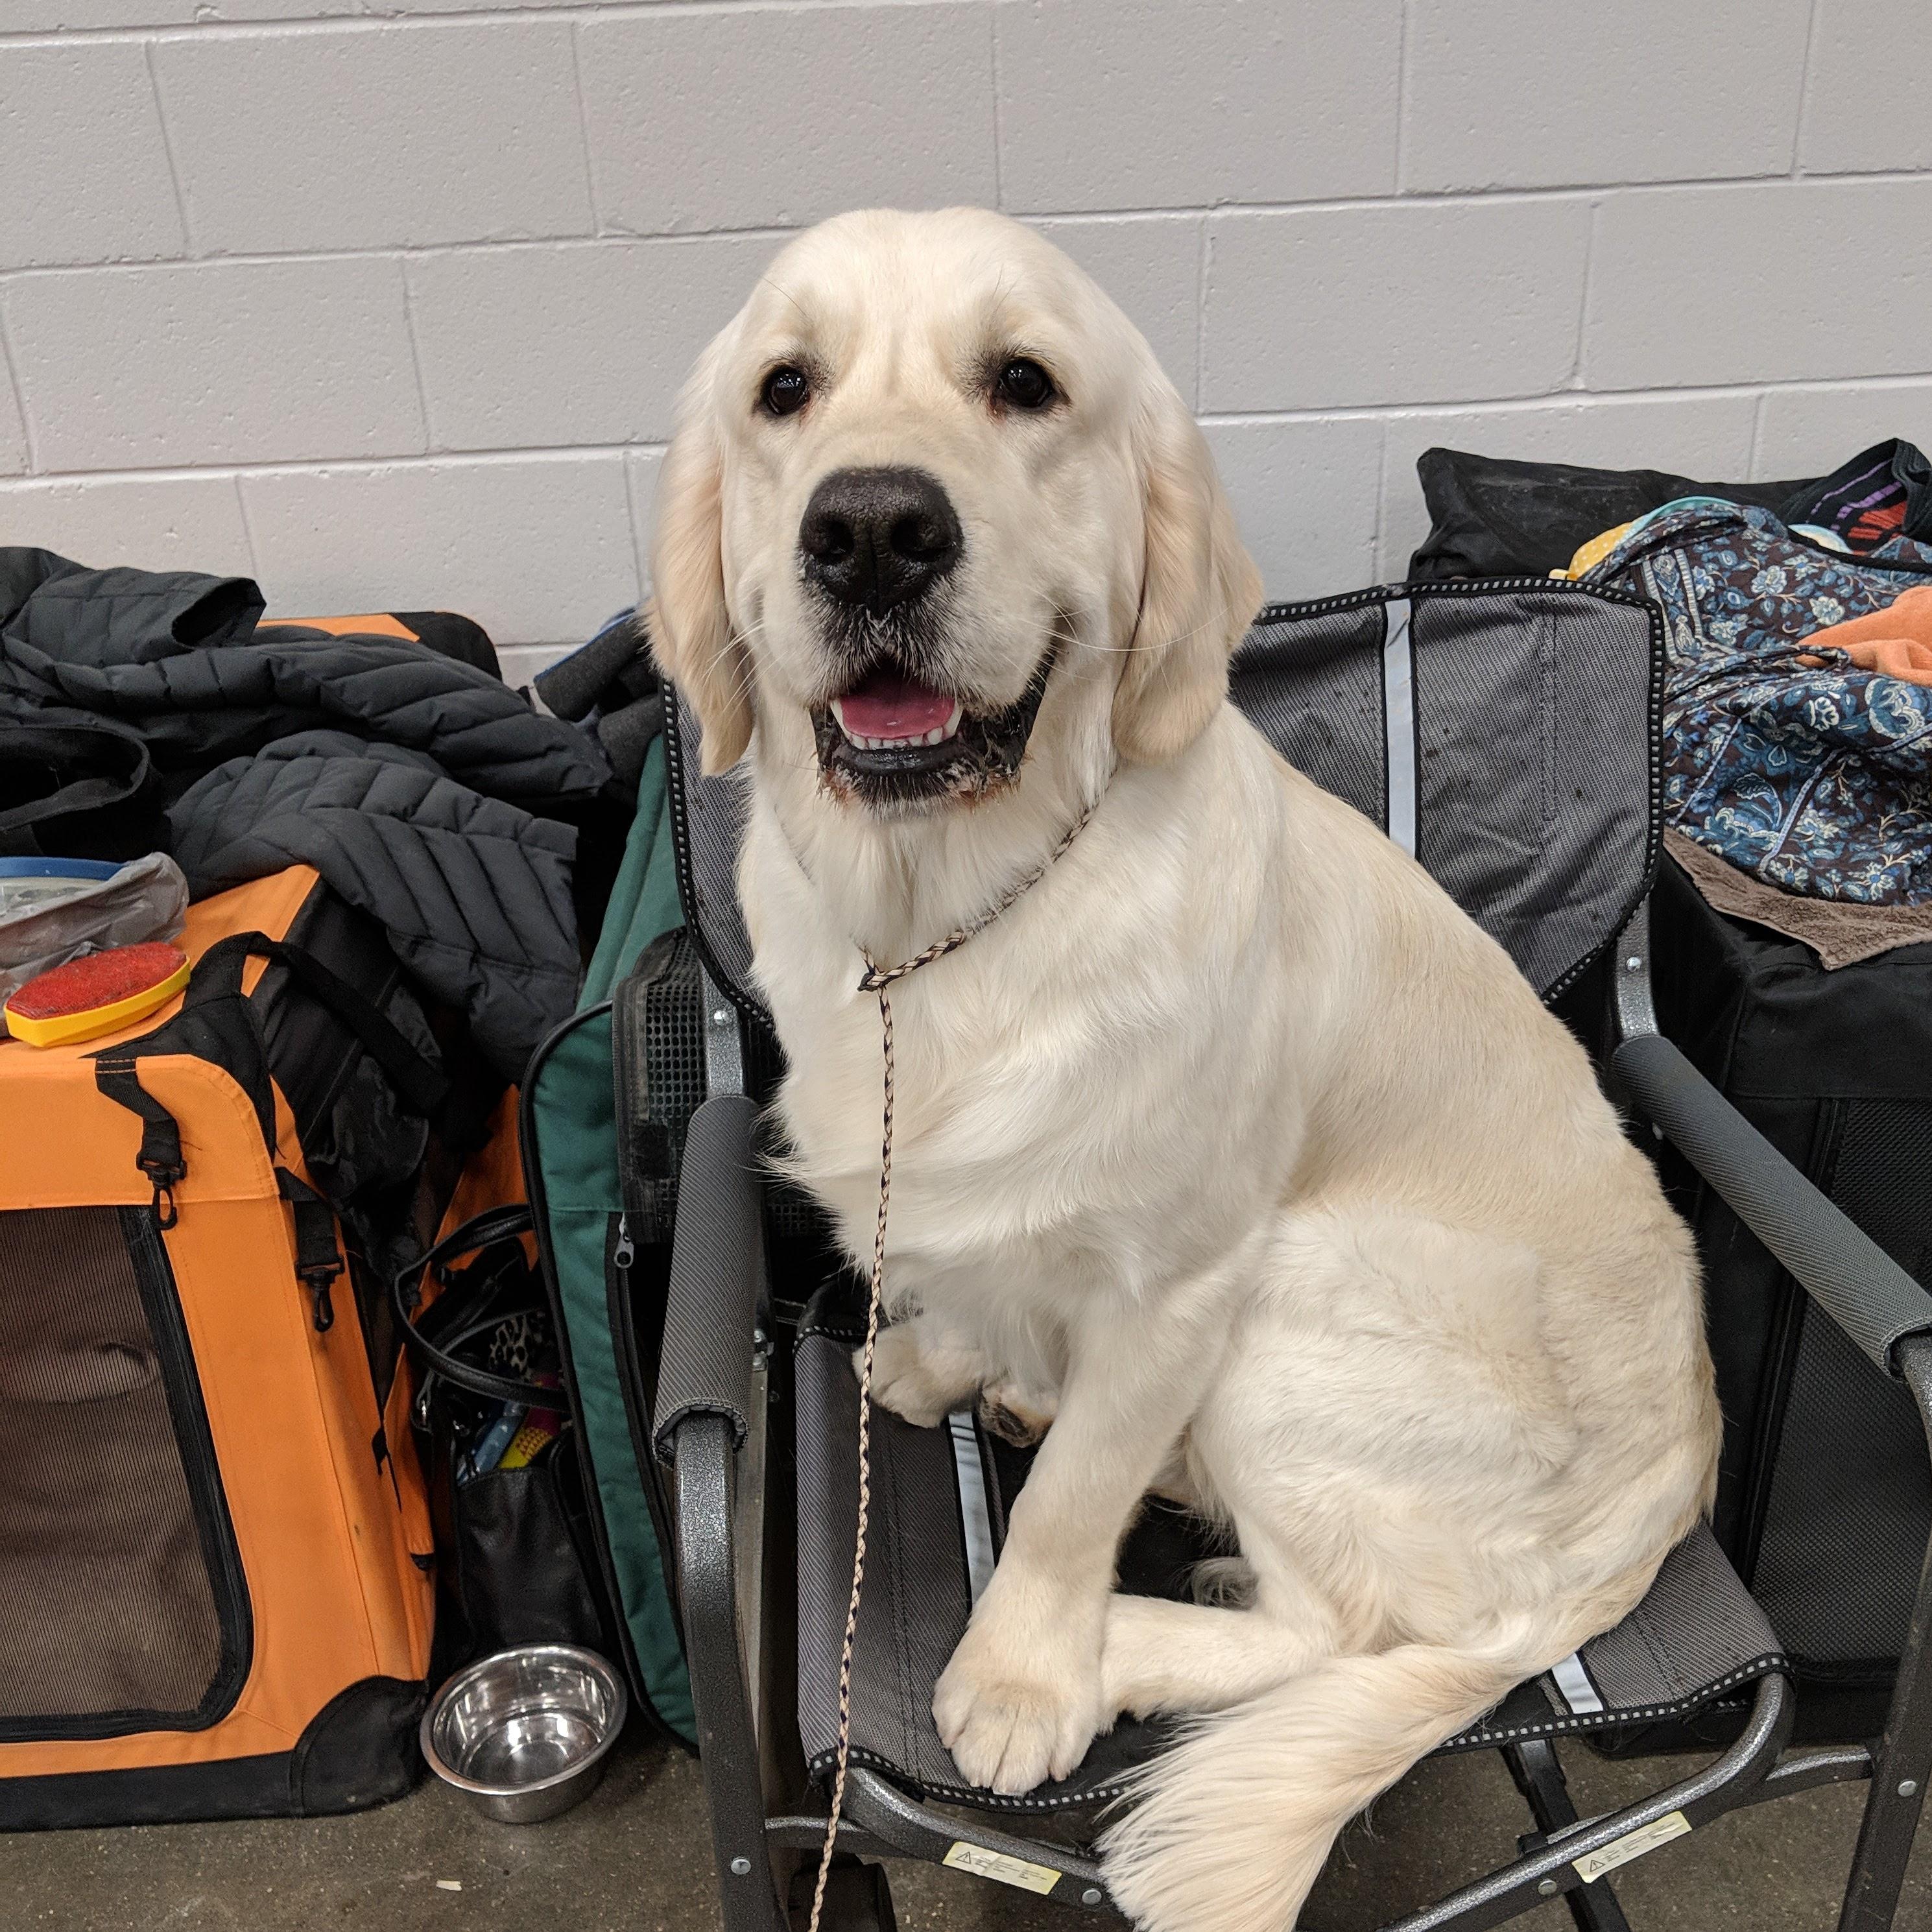 At a Dog Show